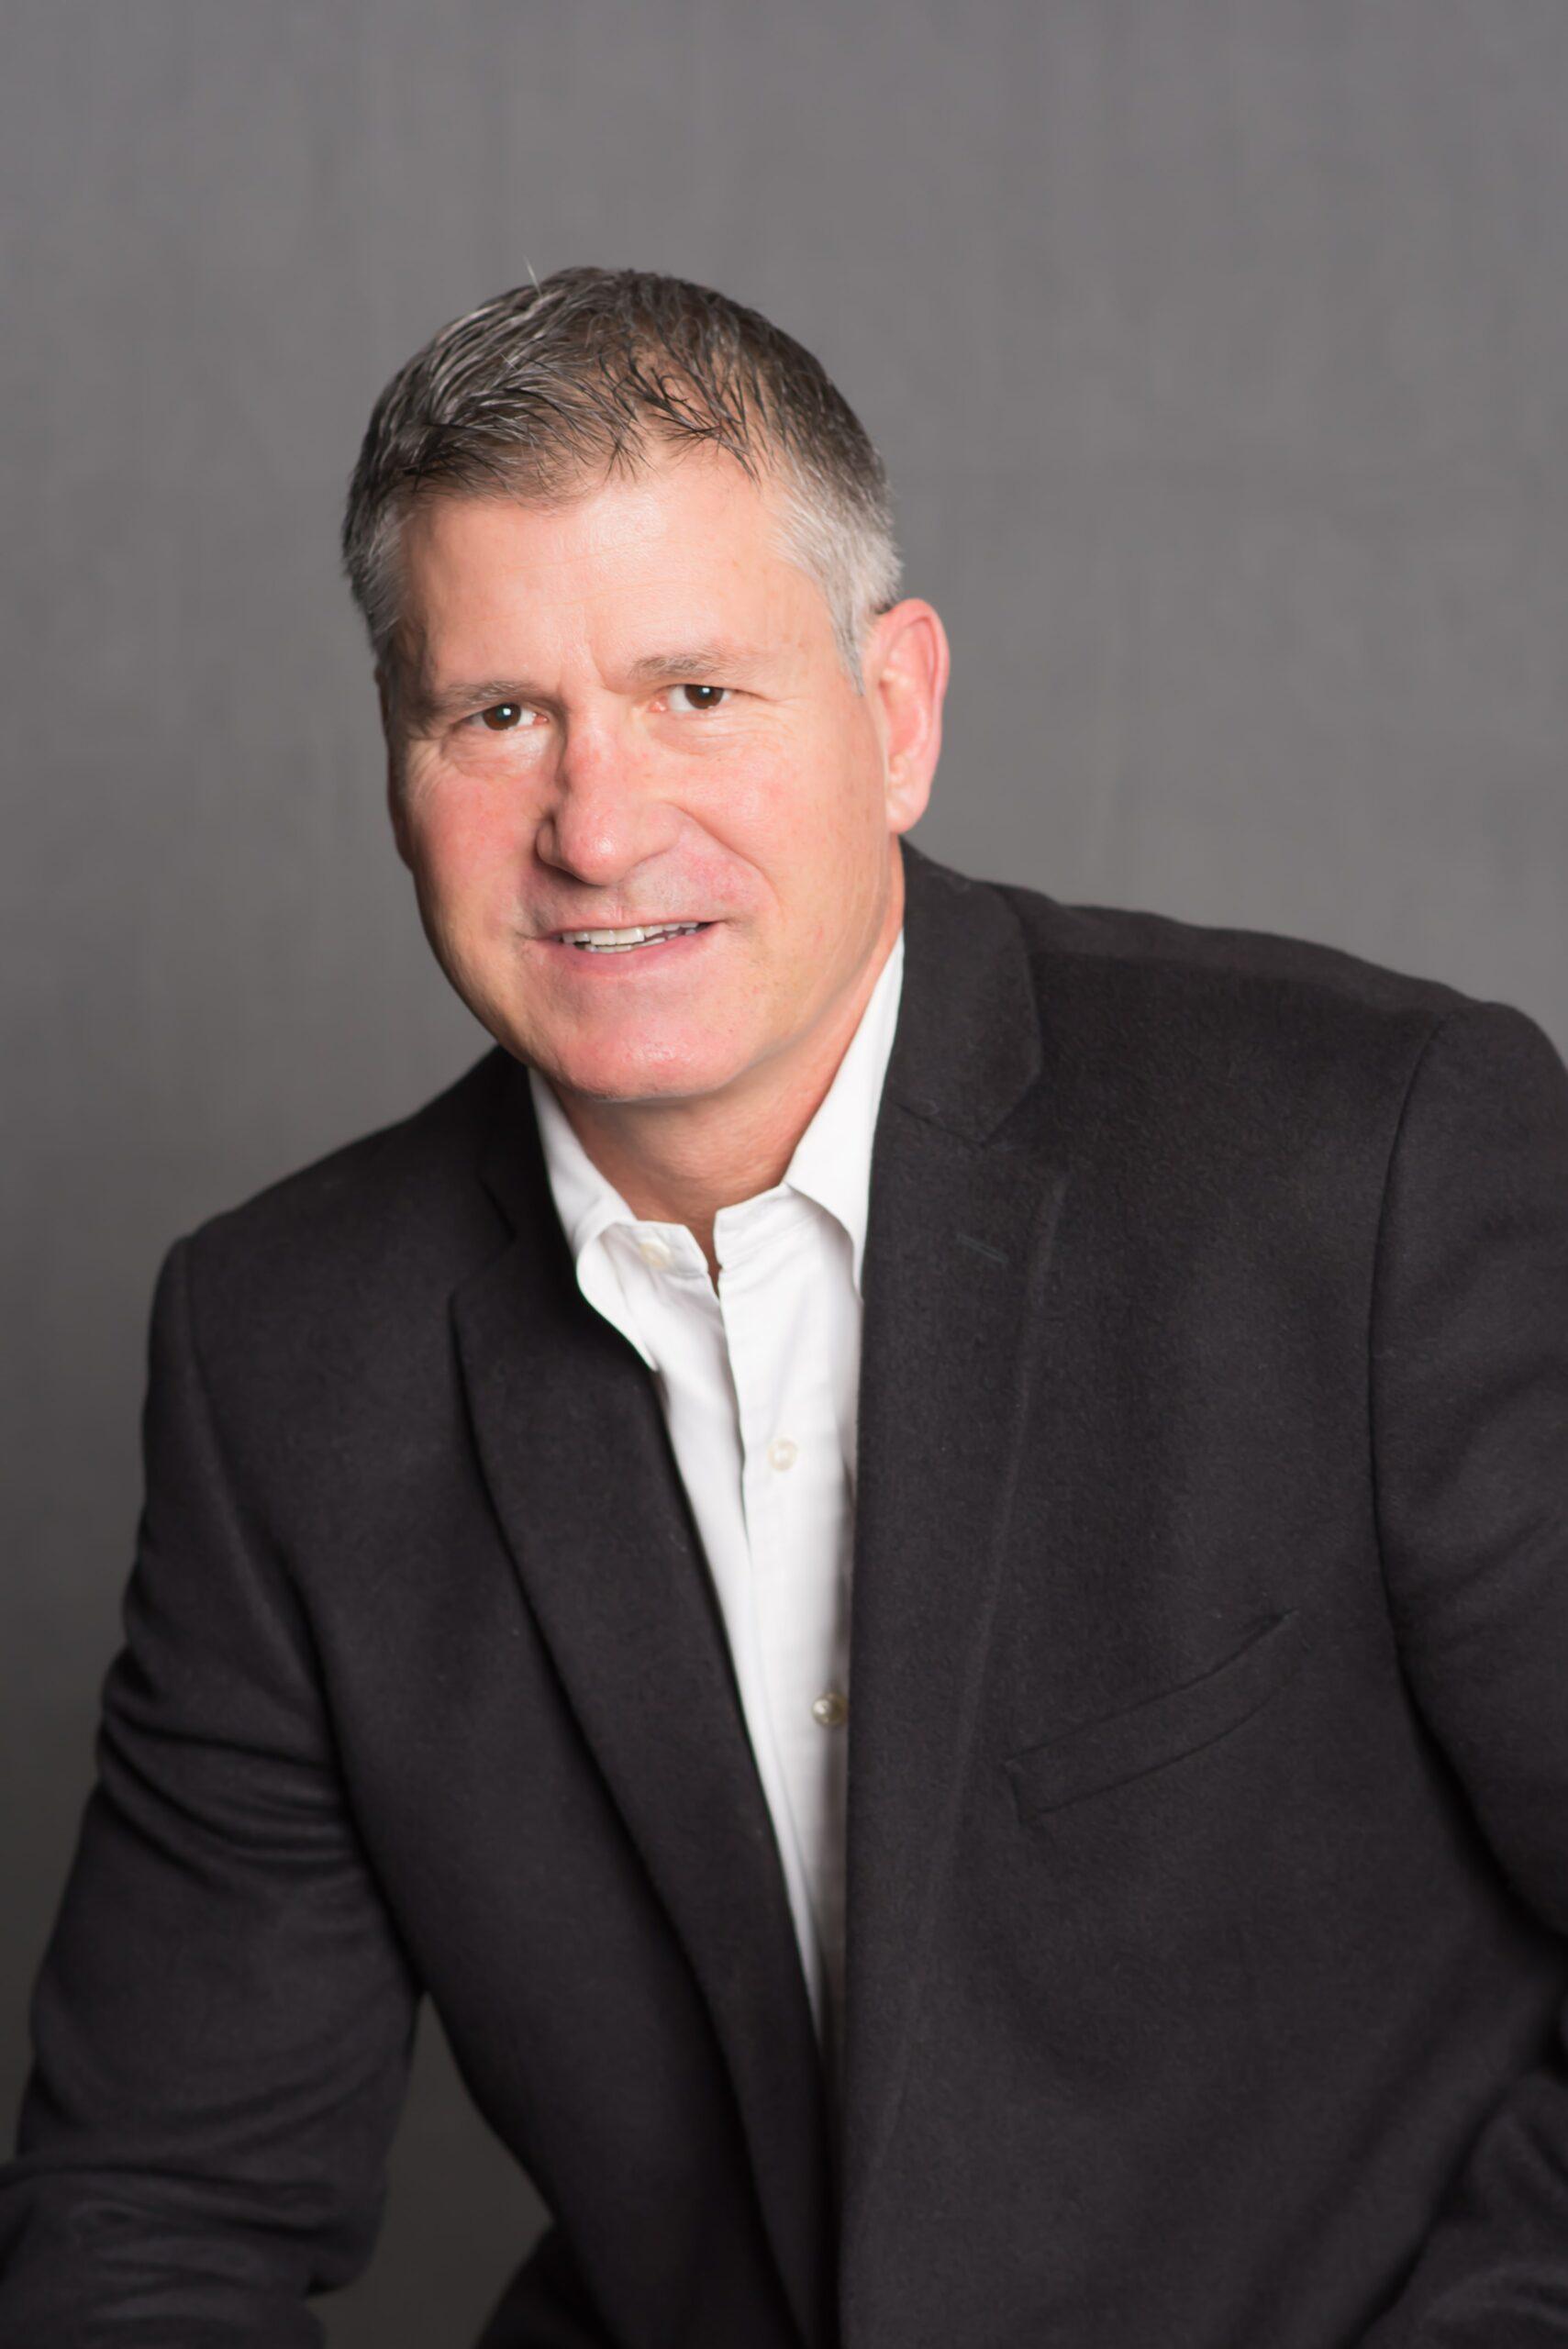 Jeff Giltner